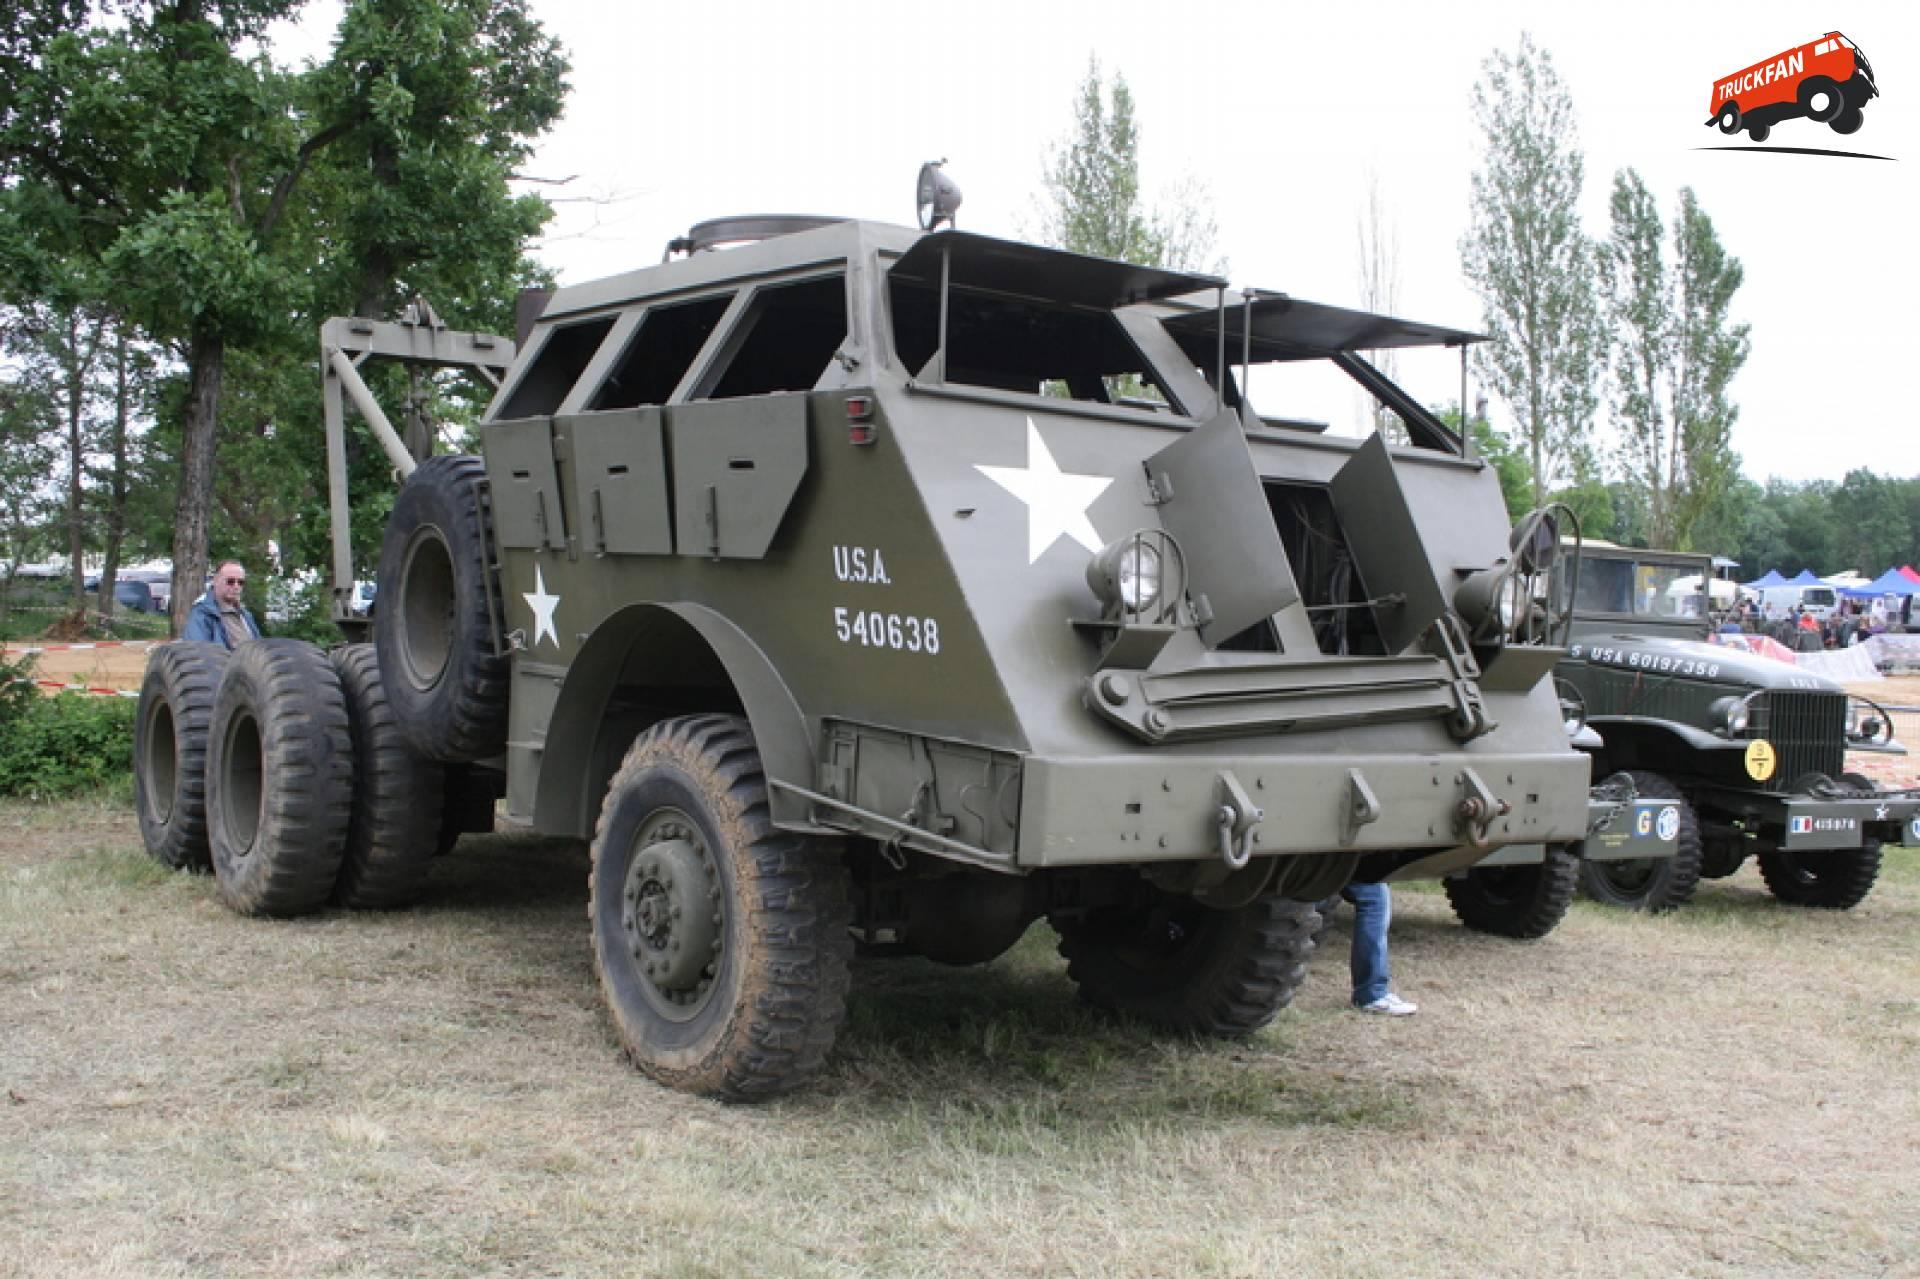 Pacific M25 Dragon Wagon